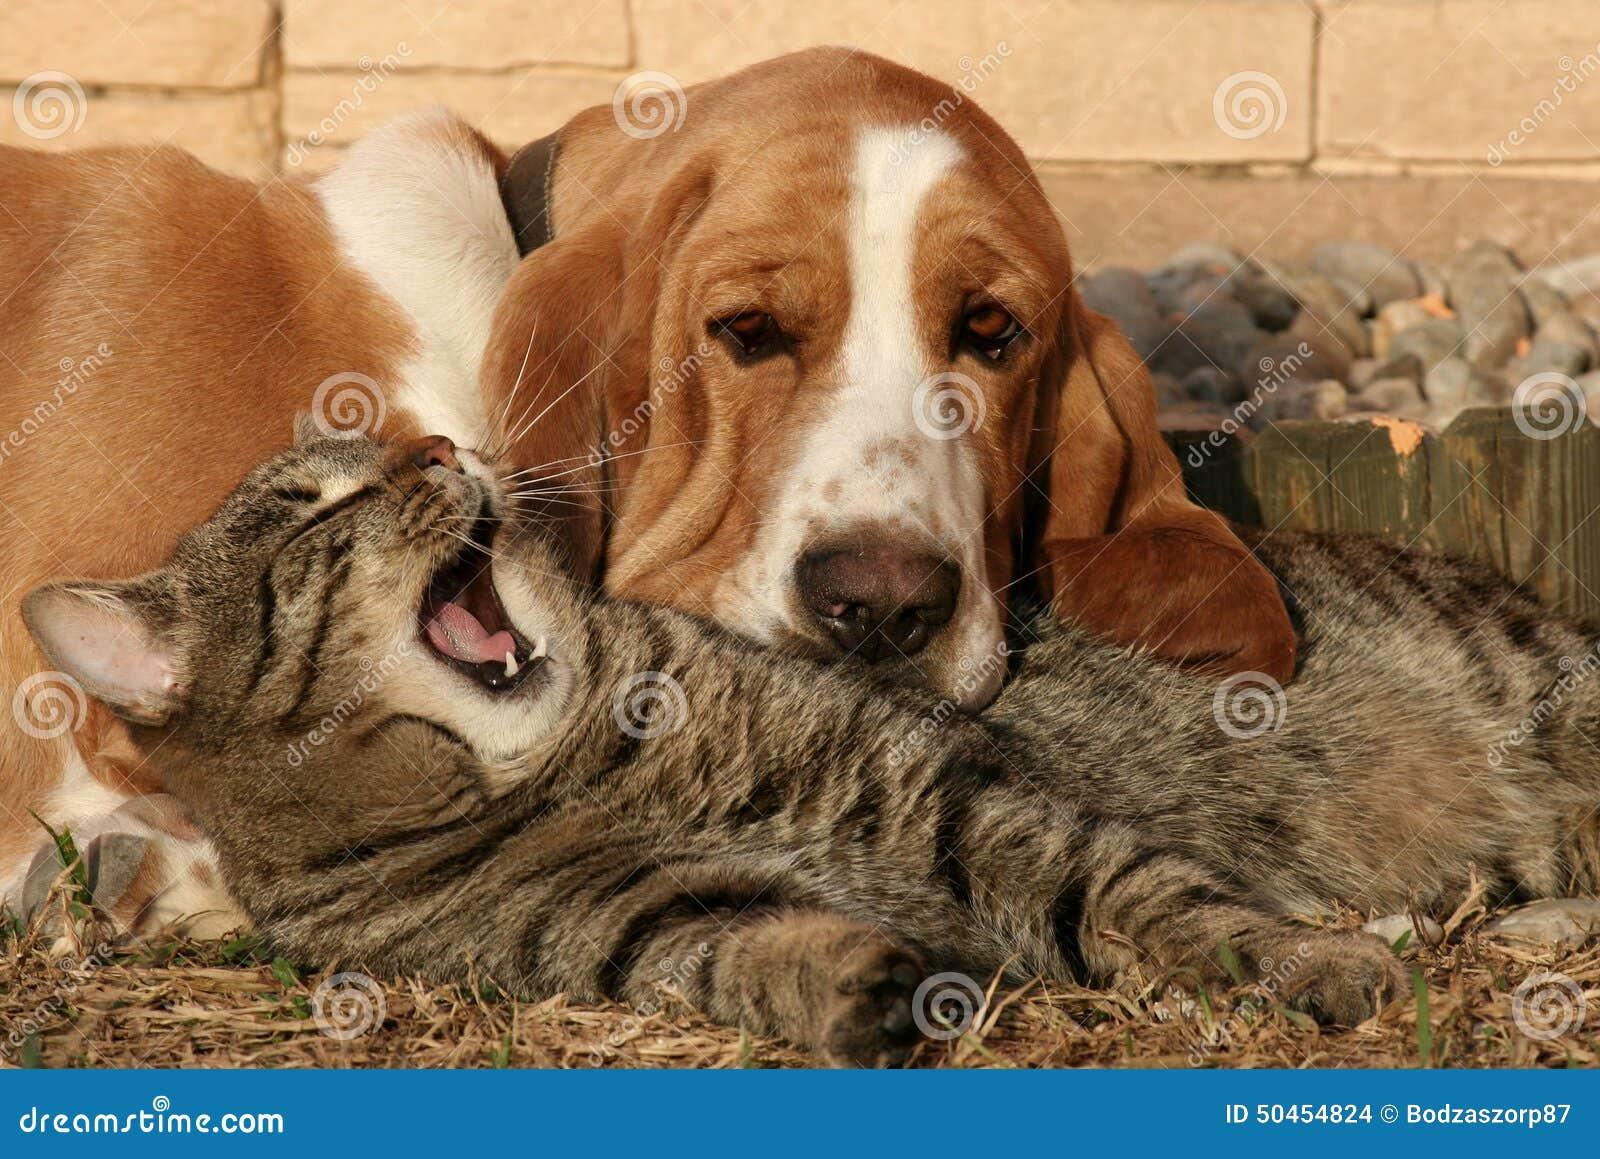 Cat Pillow Dog Blanket Iii Stock Photo Image 50454824